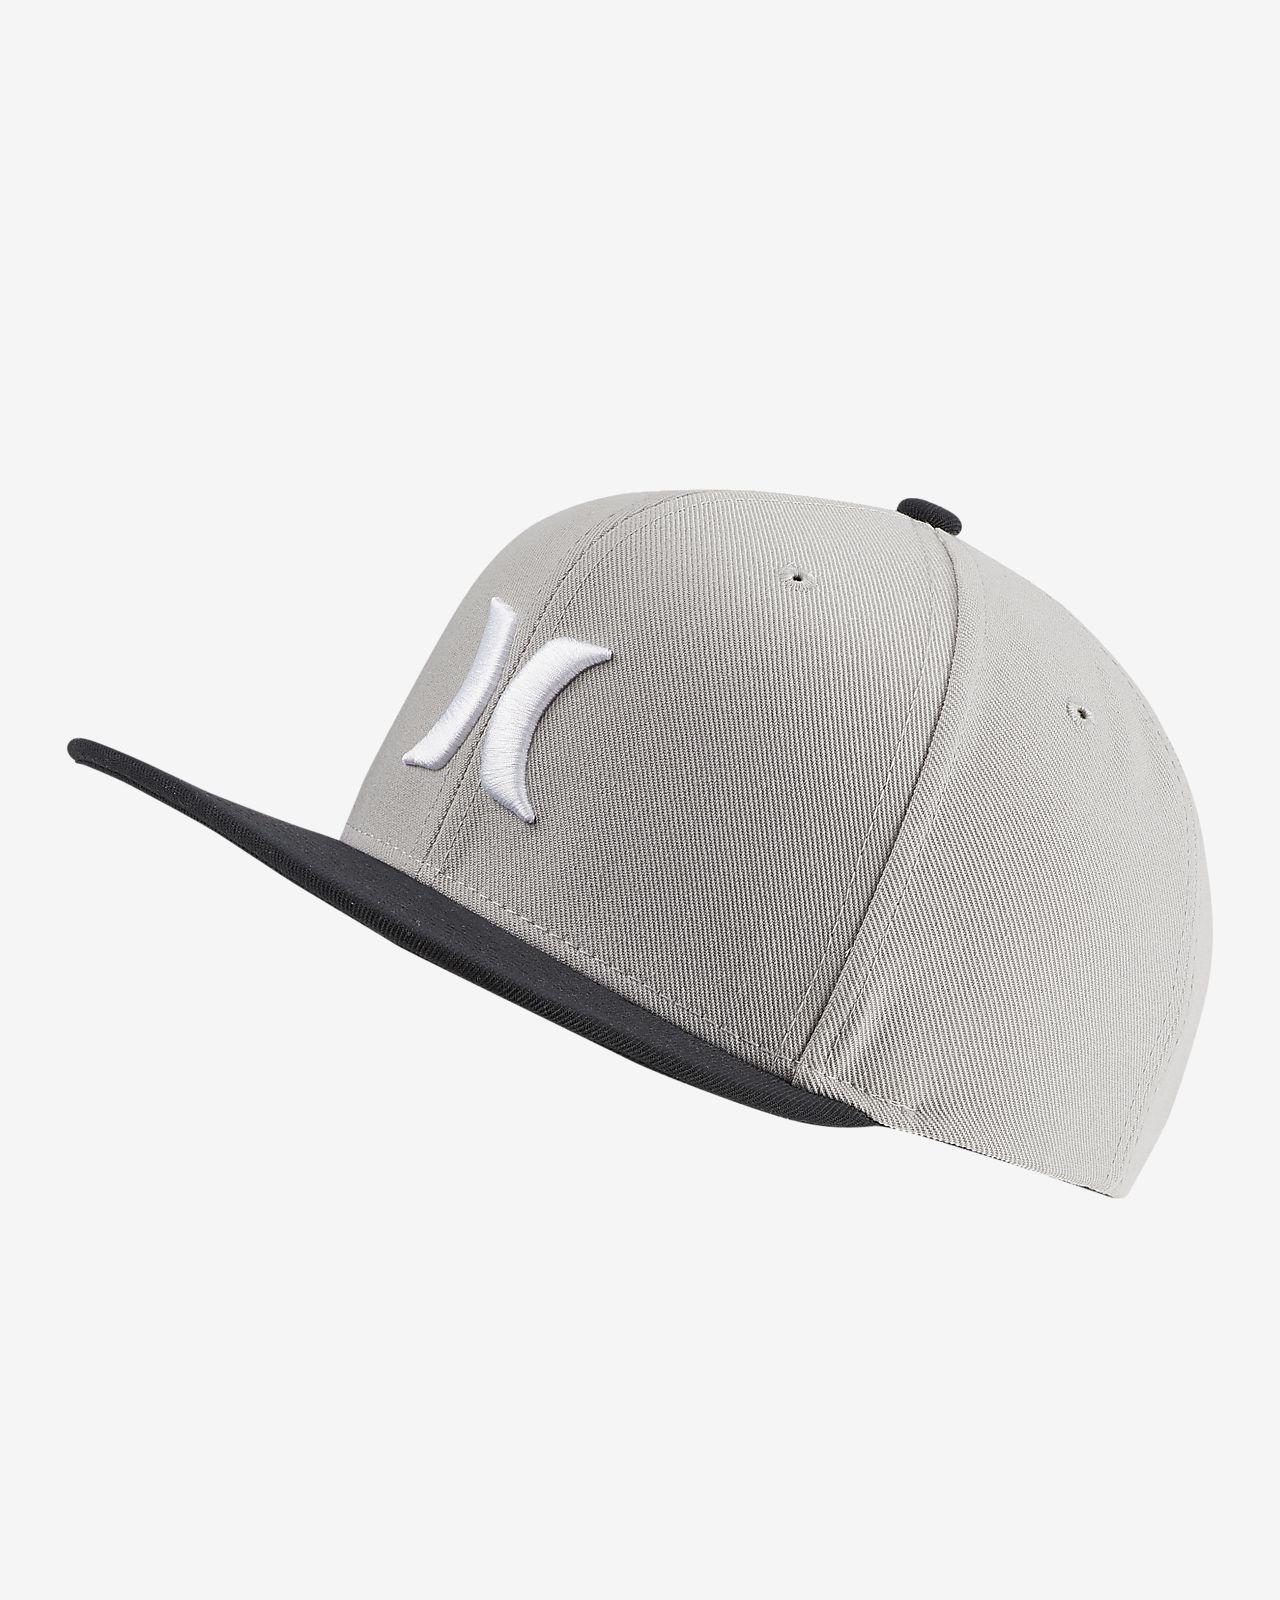 Hurley Dri-FIT Icon Men's Hat